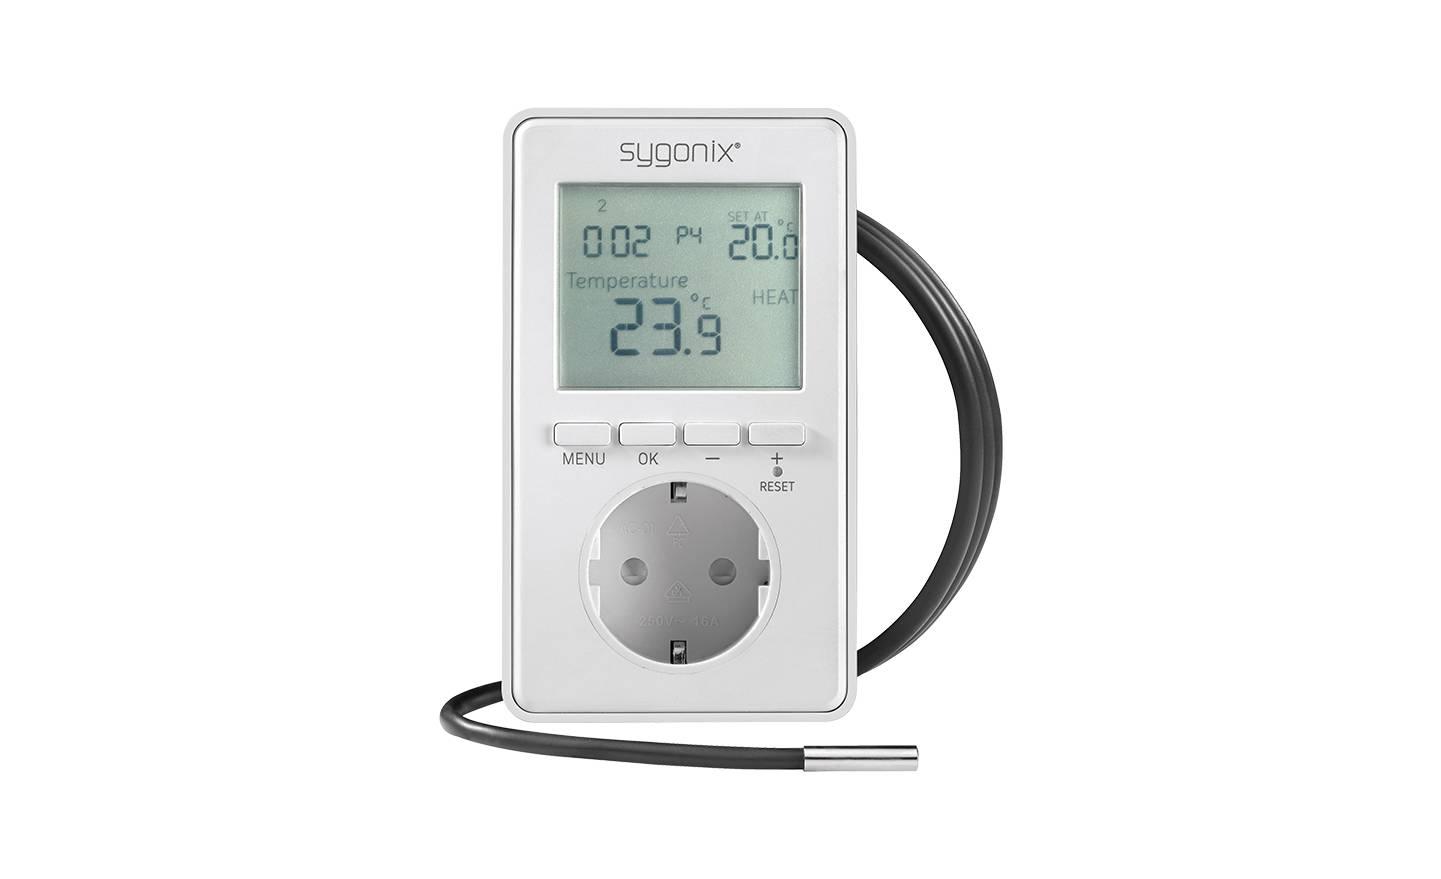 Sygonix - Raumthermostat